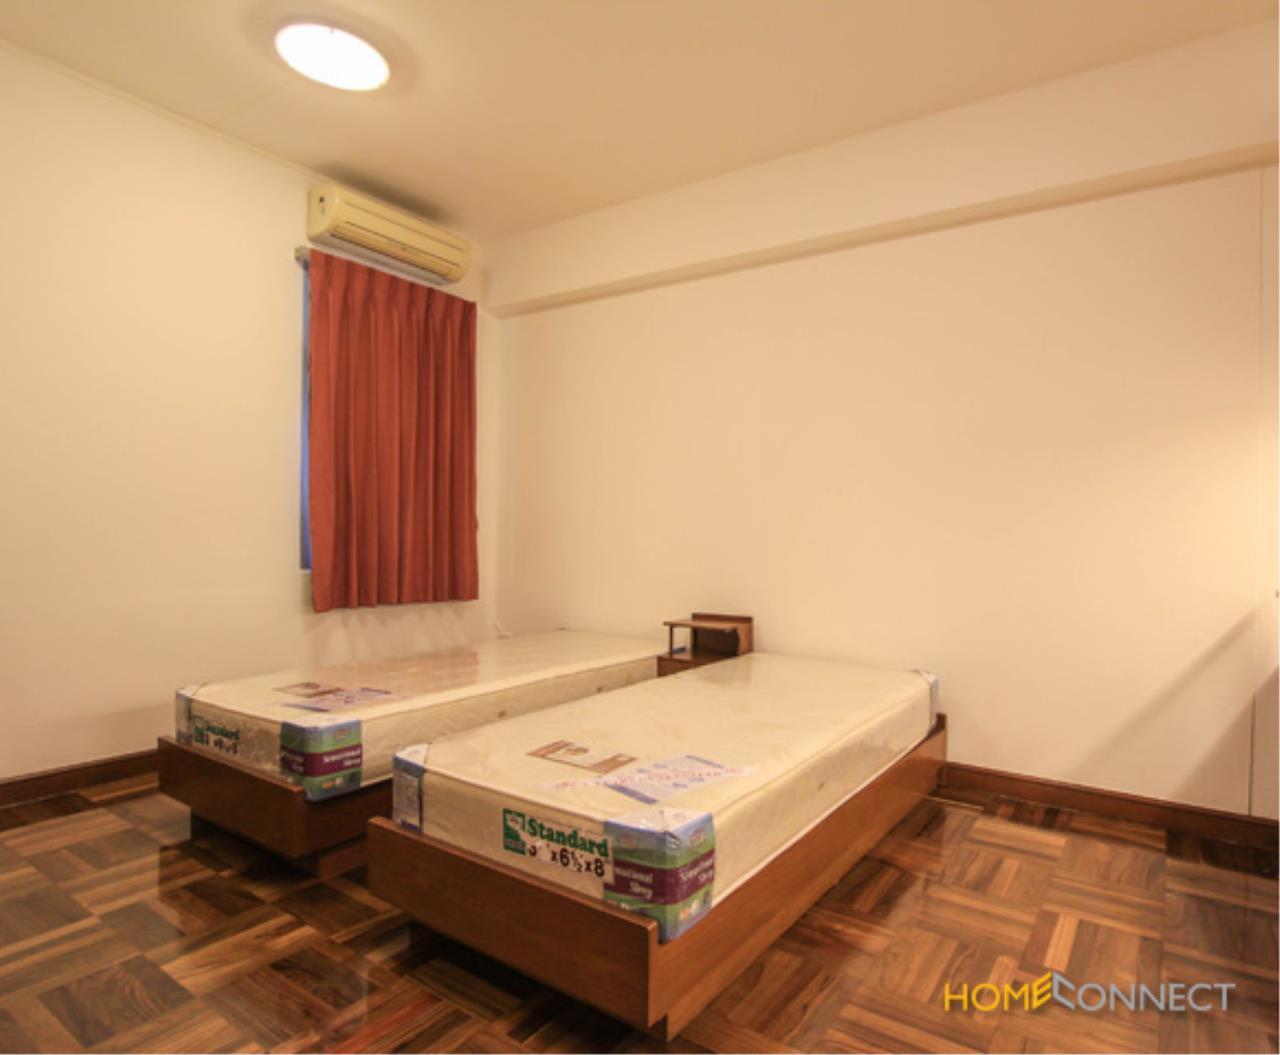 Home Connect Thailand Agency's C.S Villa Condominium for Rent 7